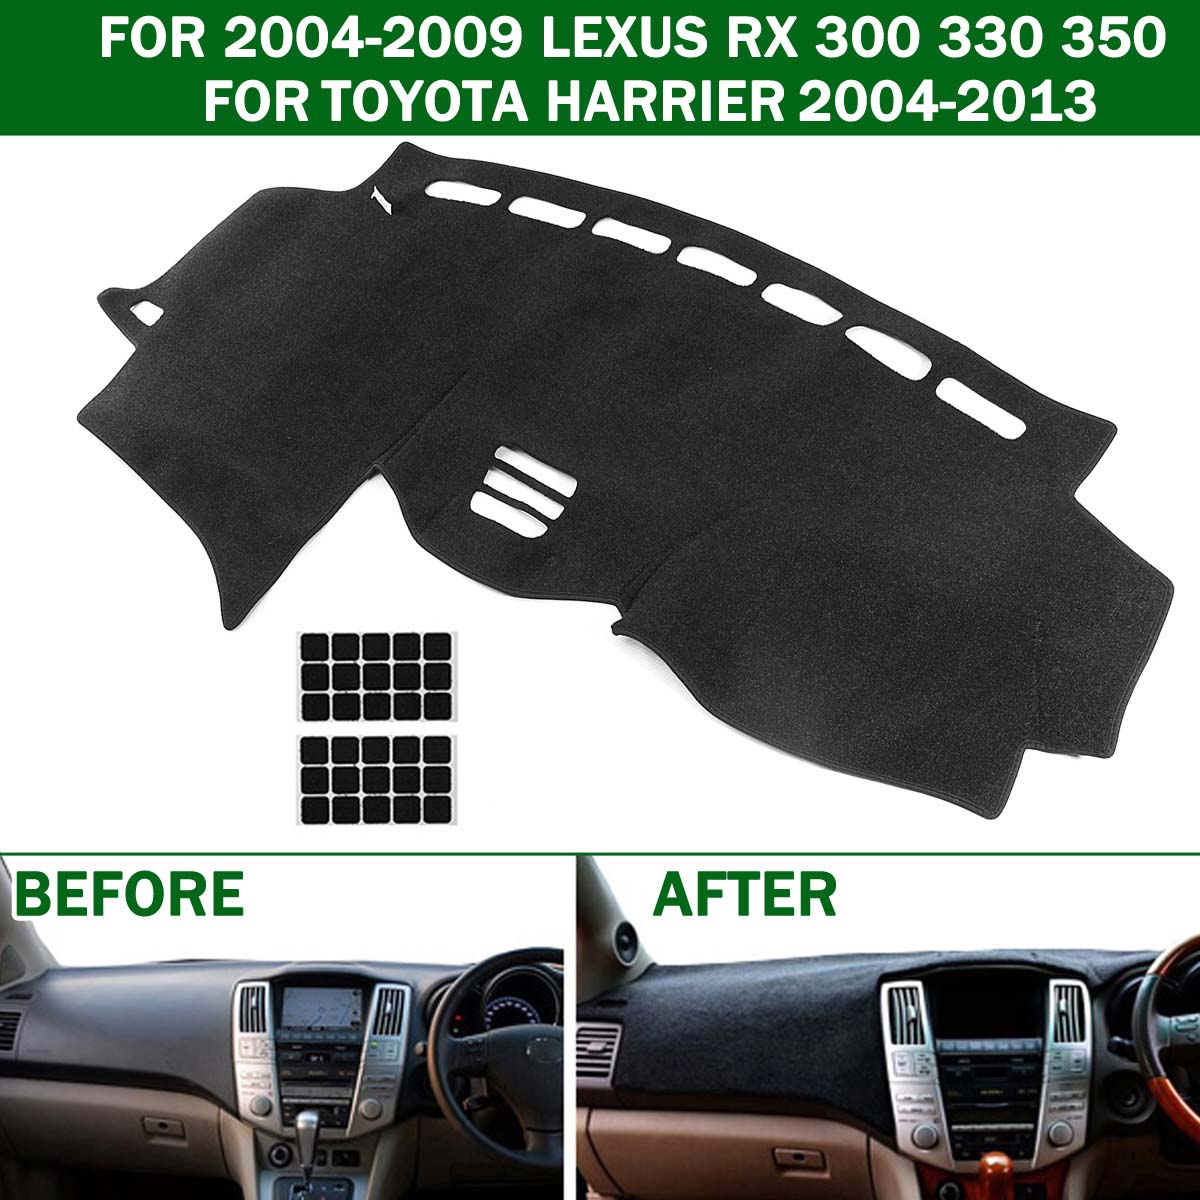 1x Car Dashboard Mat Dashmat Tampa Do Painel de Bordo Pad Anti Slip para o LEXUS RX 300 330 350 2004-2009 para Toyota Harrier 2004-2013